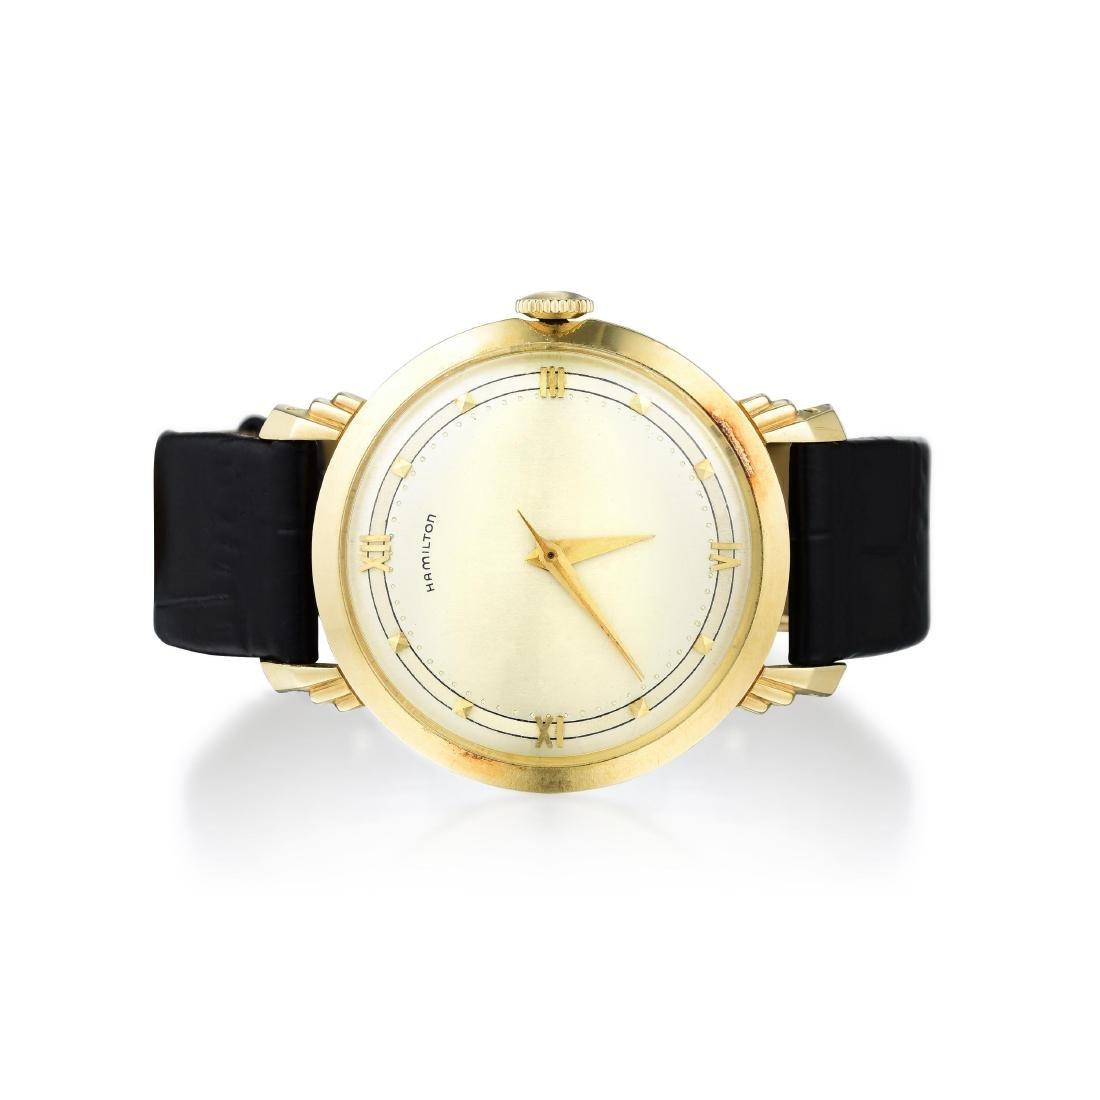 A 14K Gold Hamilton Men's Watch